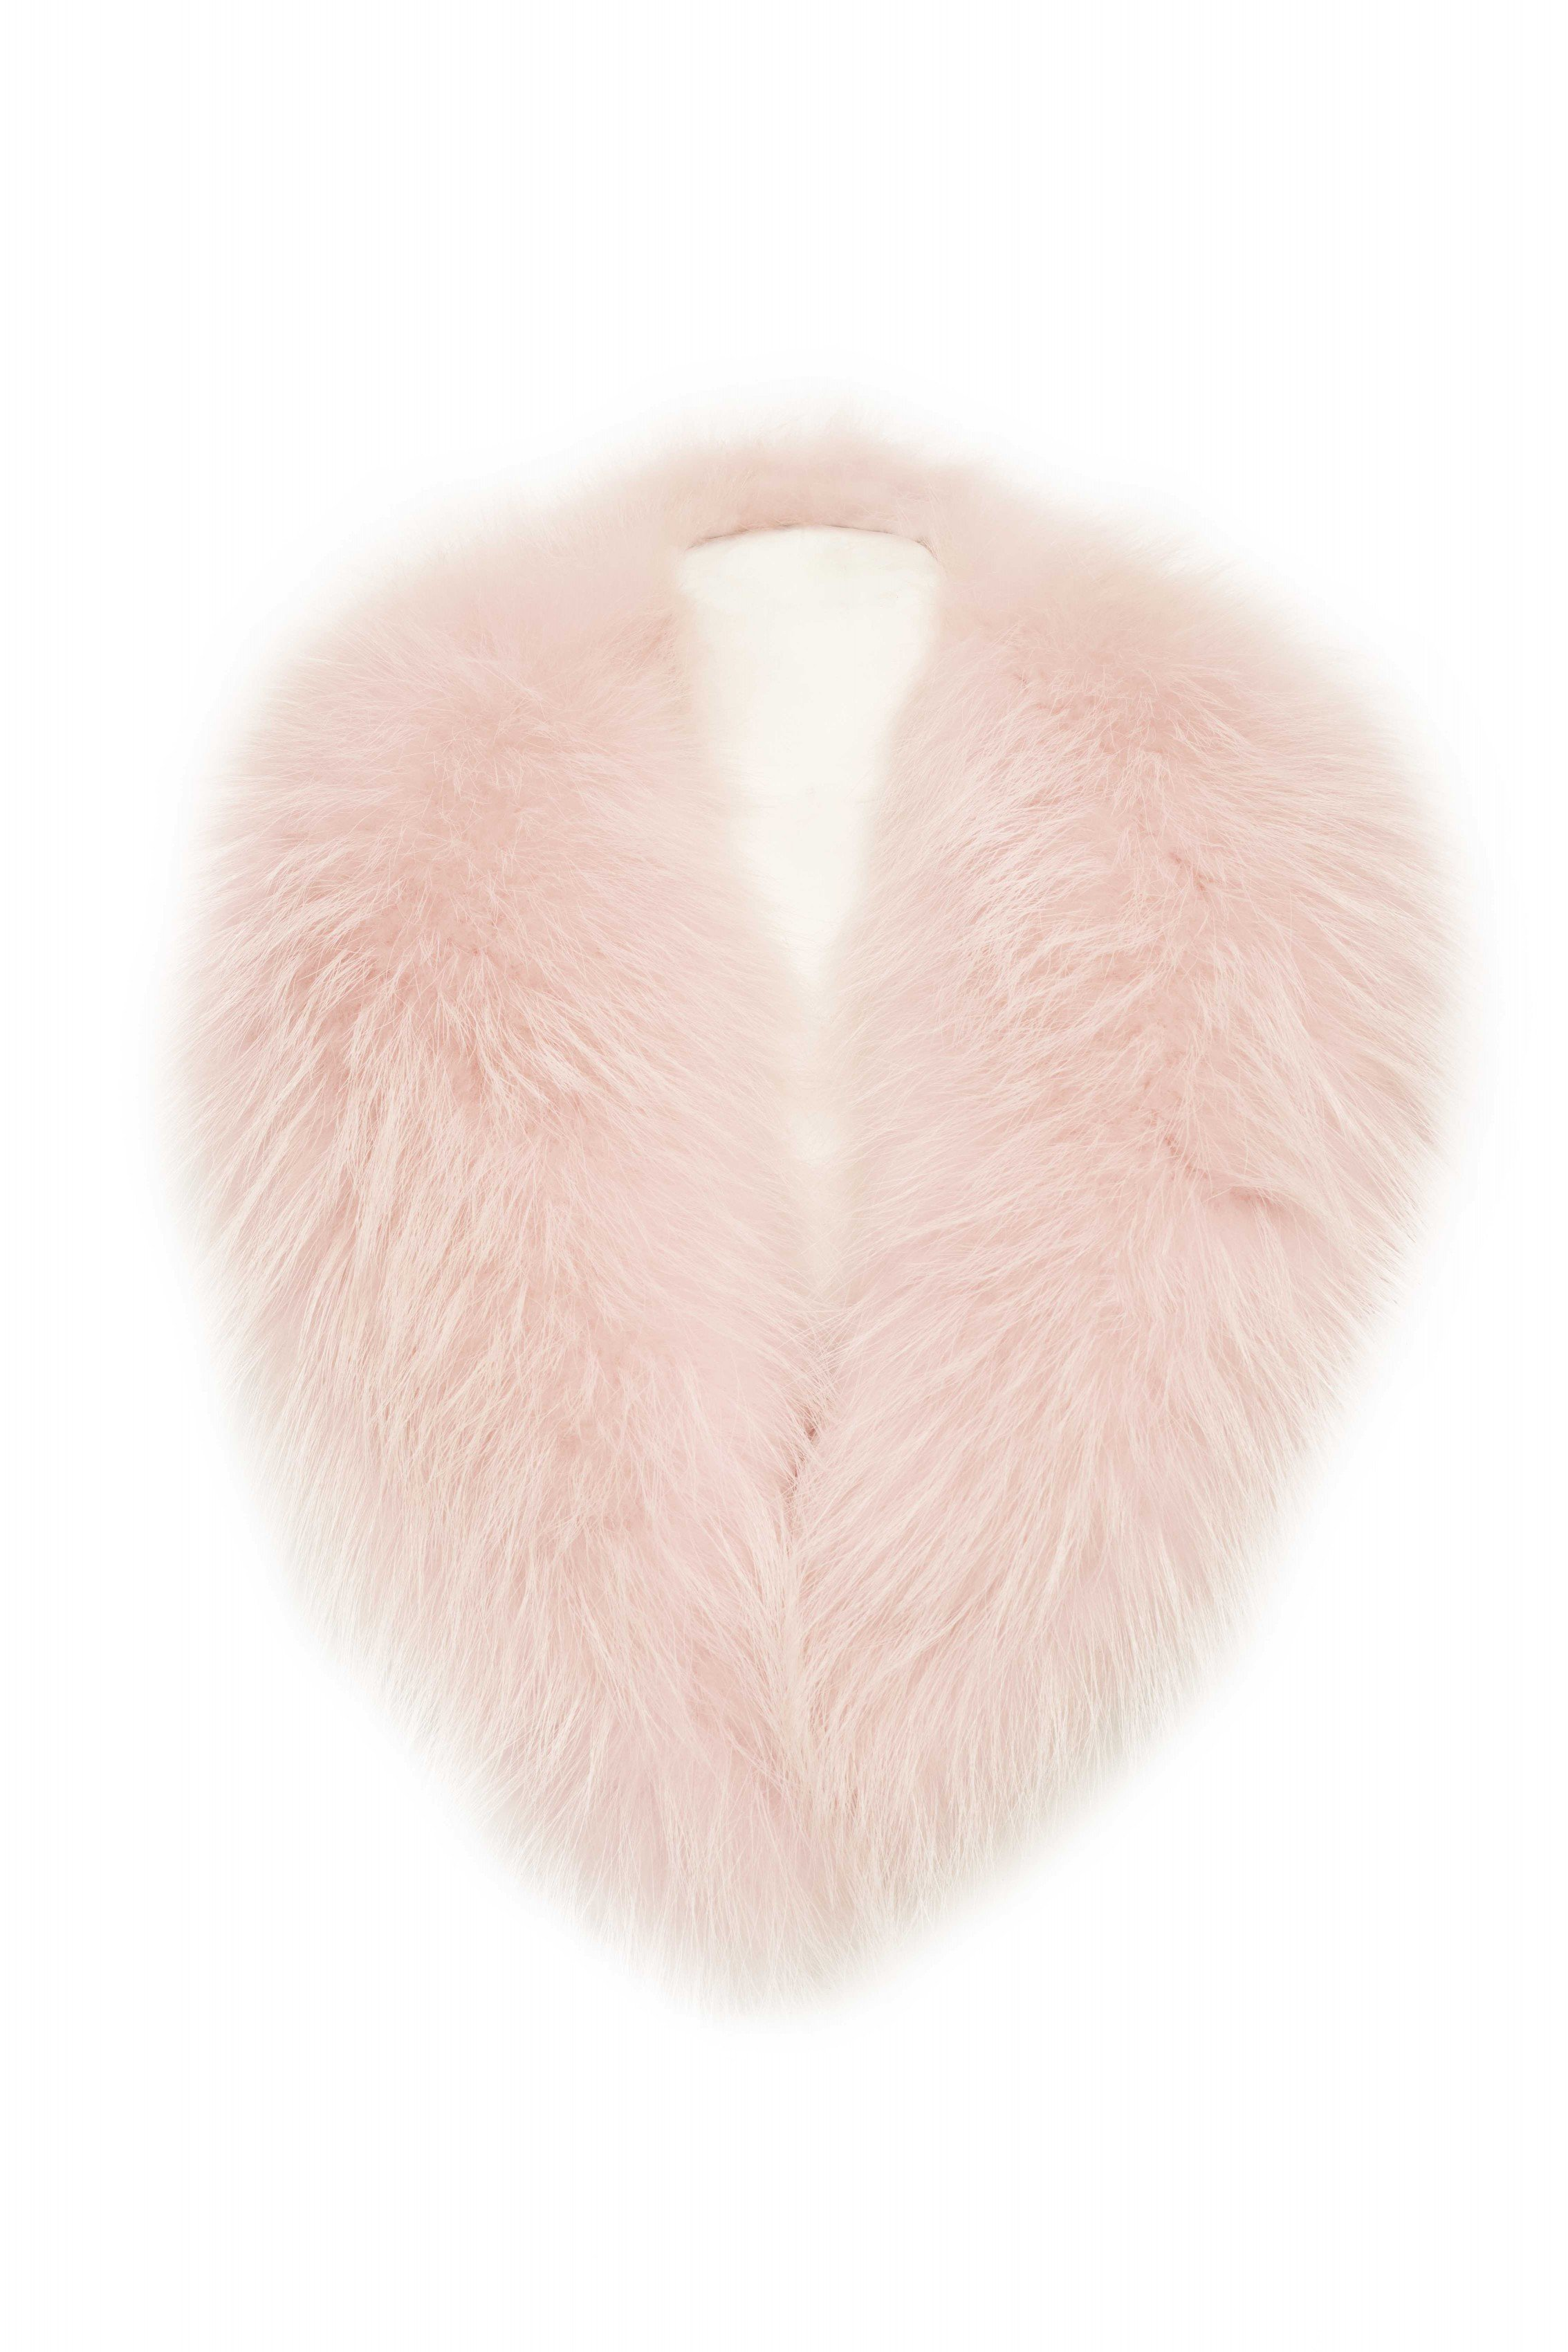 POPSKI LONDON Light Pink Fox Fur Collar